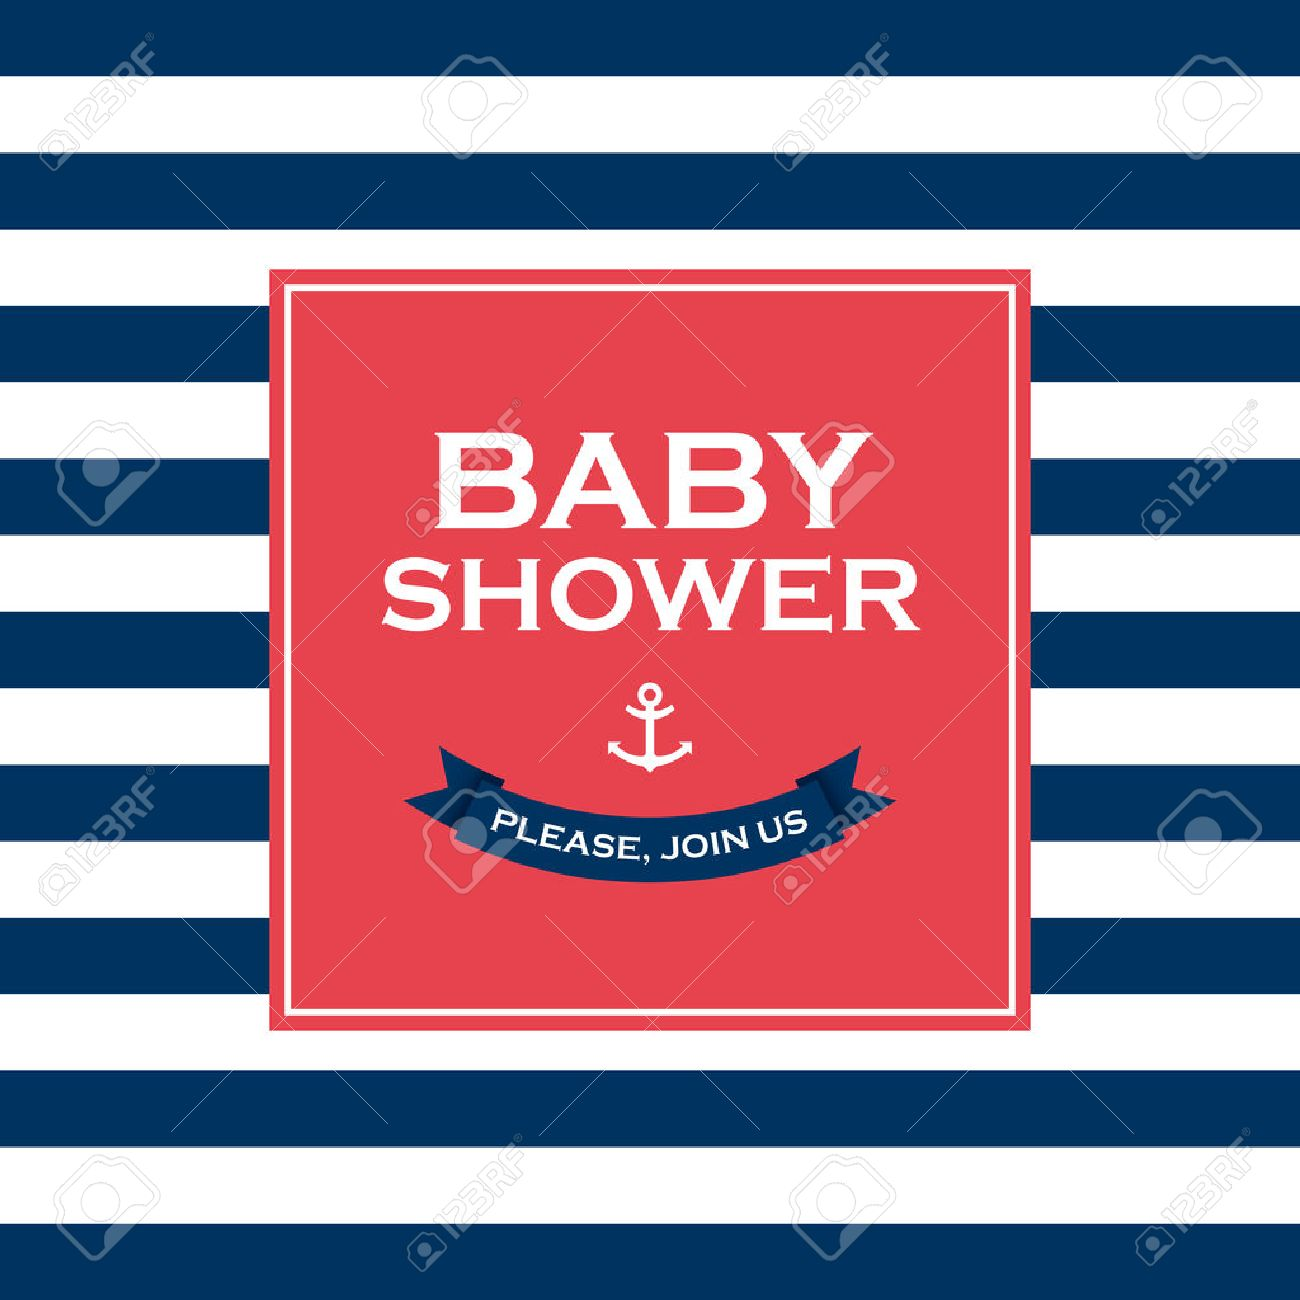 Baby Shower Card Invitation Vector Design Elements Editable Royalty ...